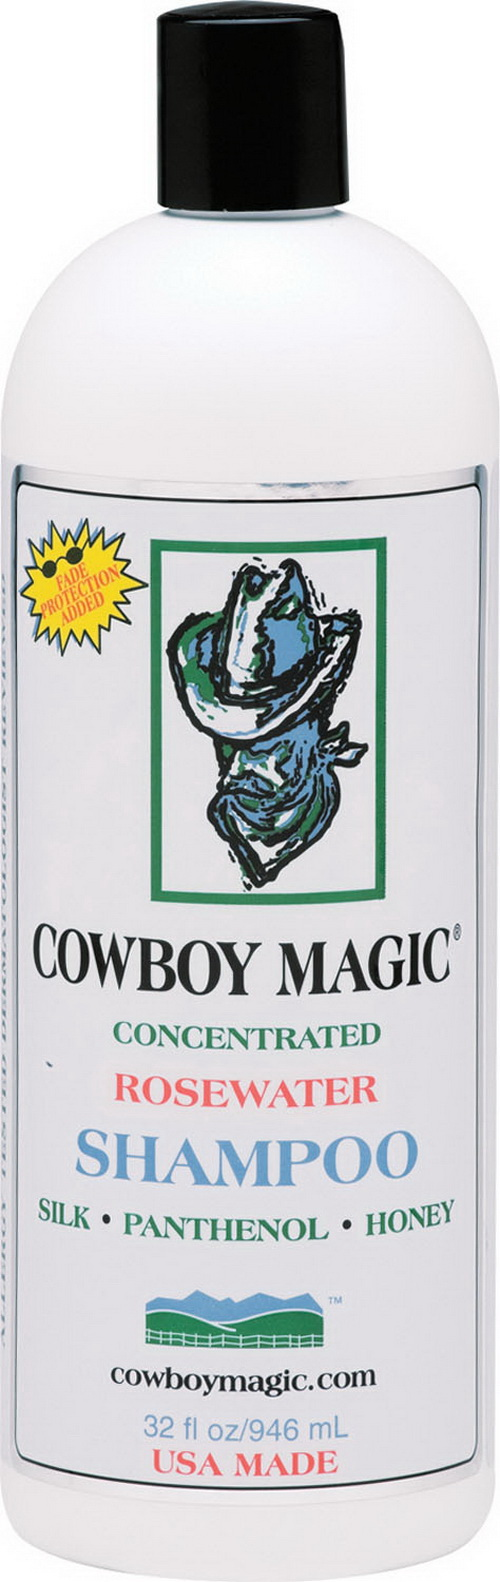 Charmar Land & Cattle Cowboy Magic Rosewater Shampoo - 32 Ounce